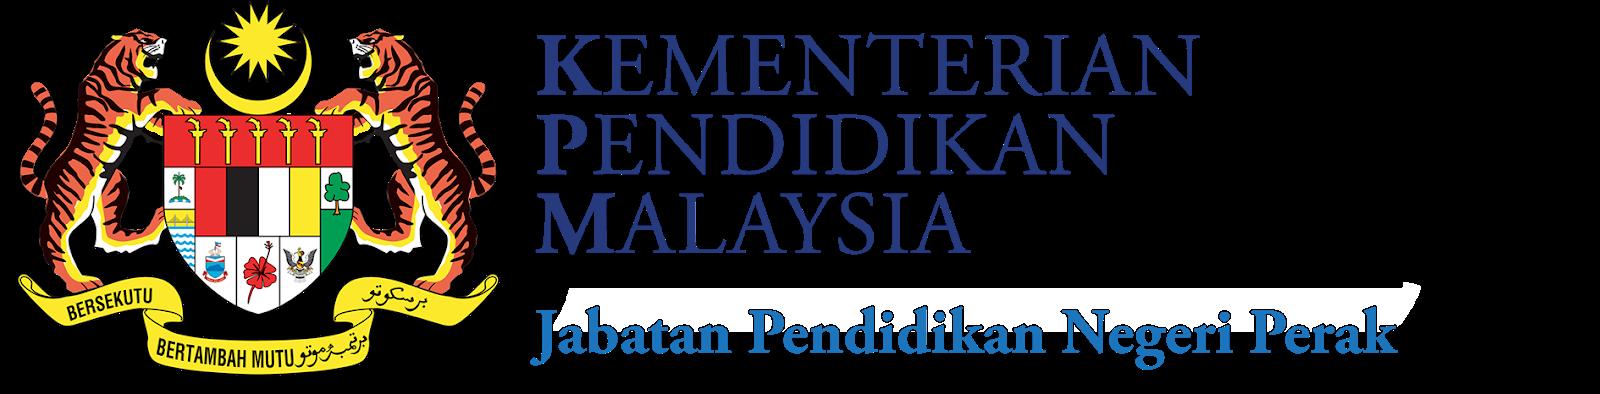 Finemotives Photography Manjung Pendidikan Logo Kpm Jpn Perak Ppd Manjung Revised 2018 Png Versi Normal 2d Shadowed